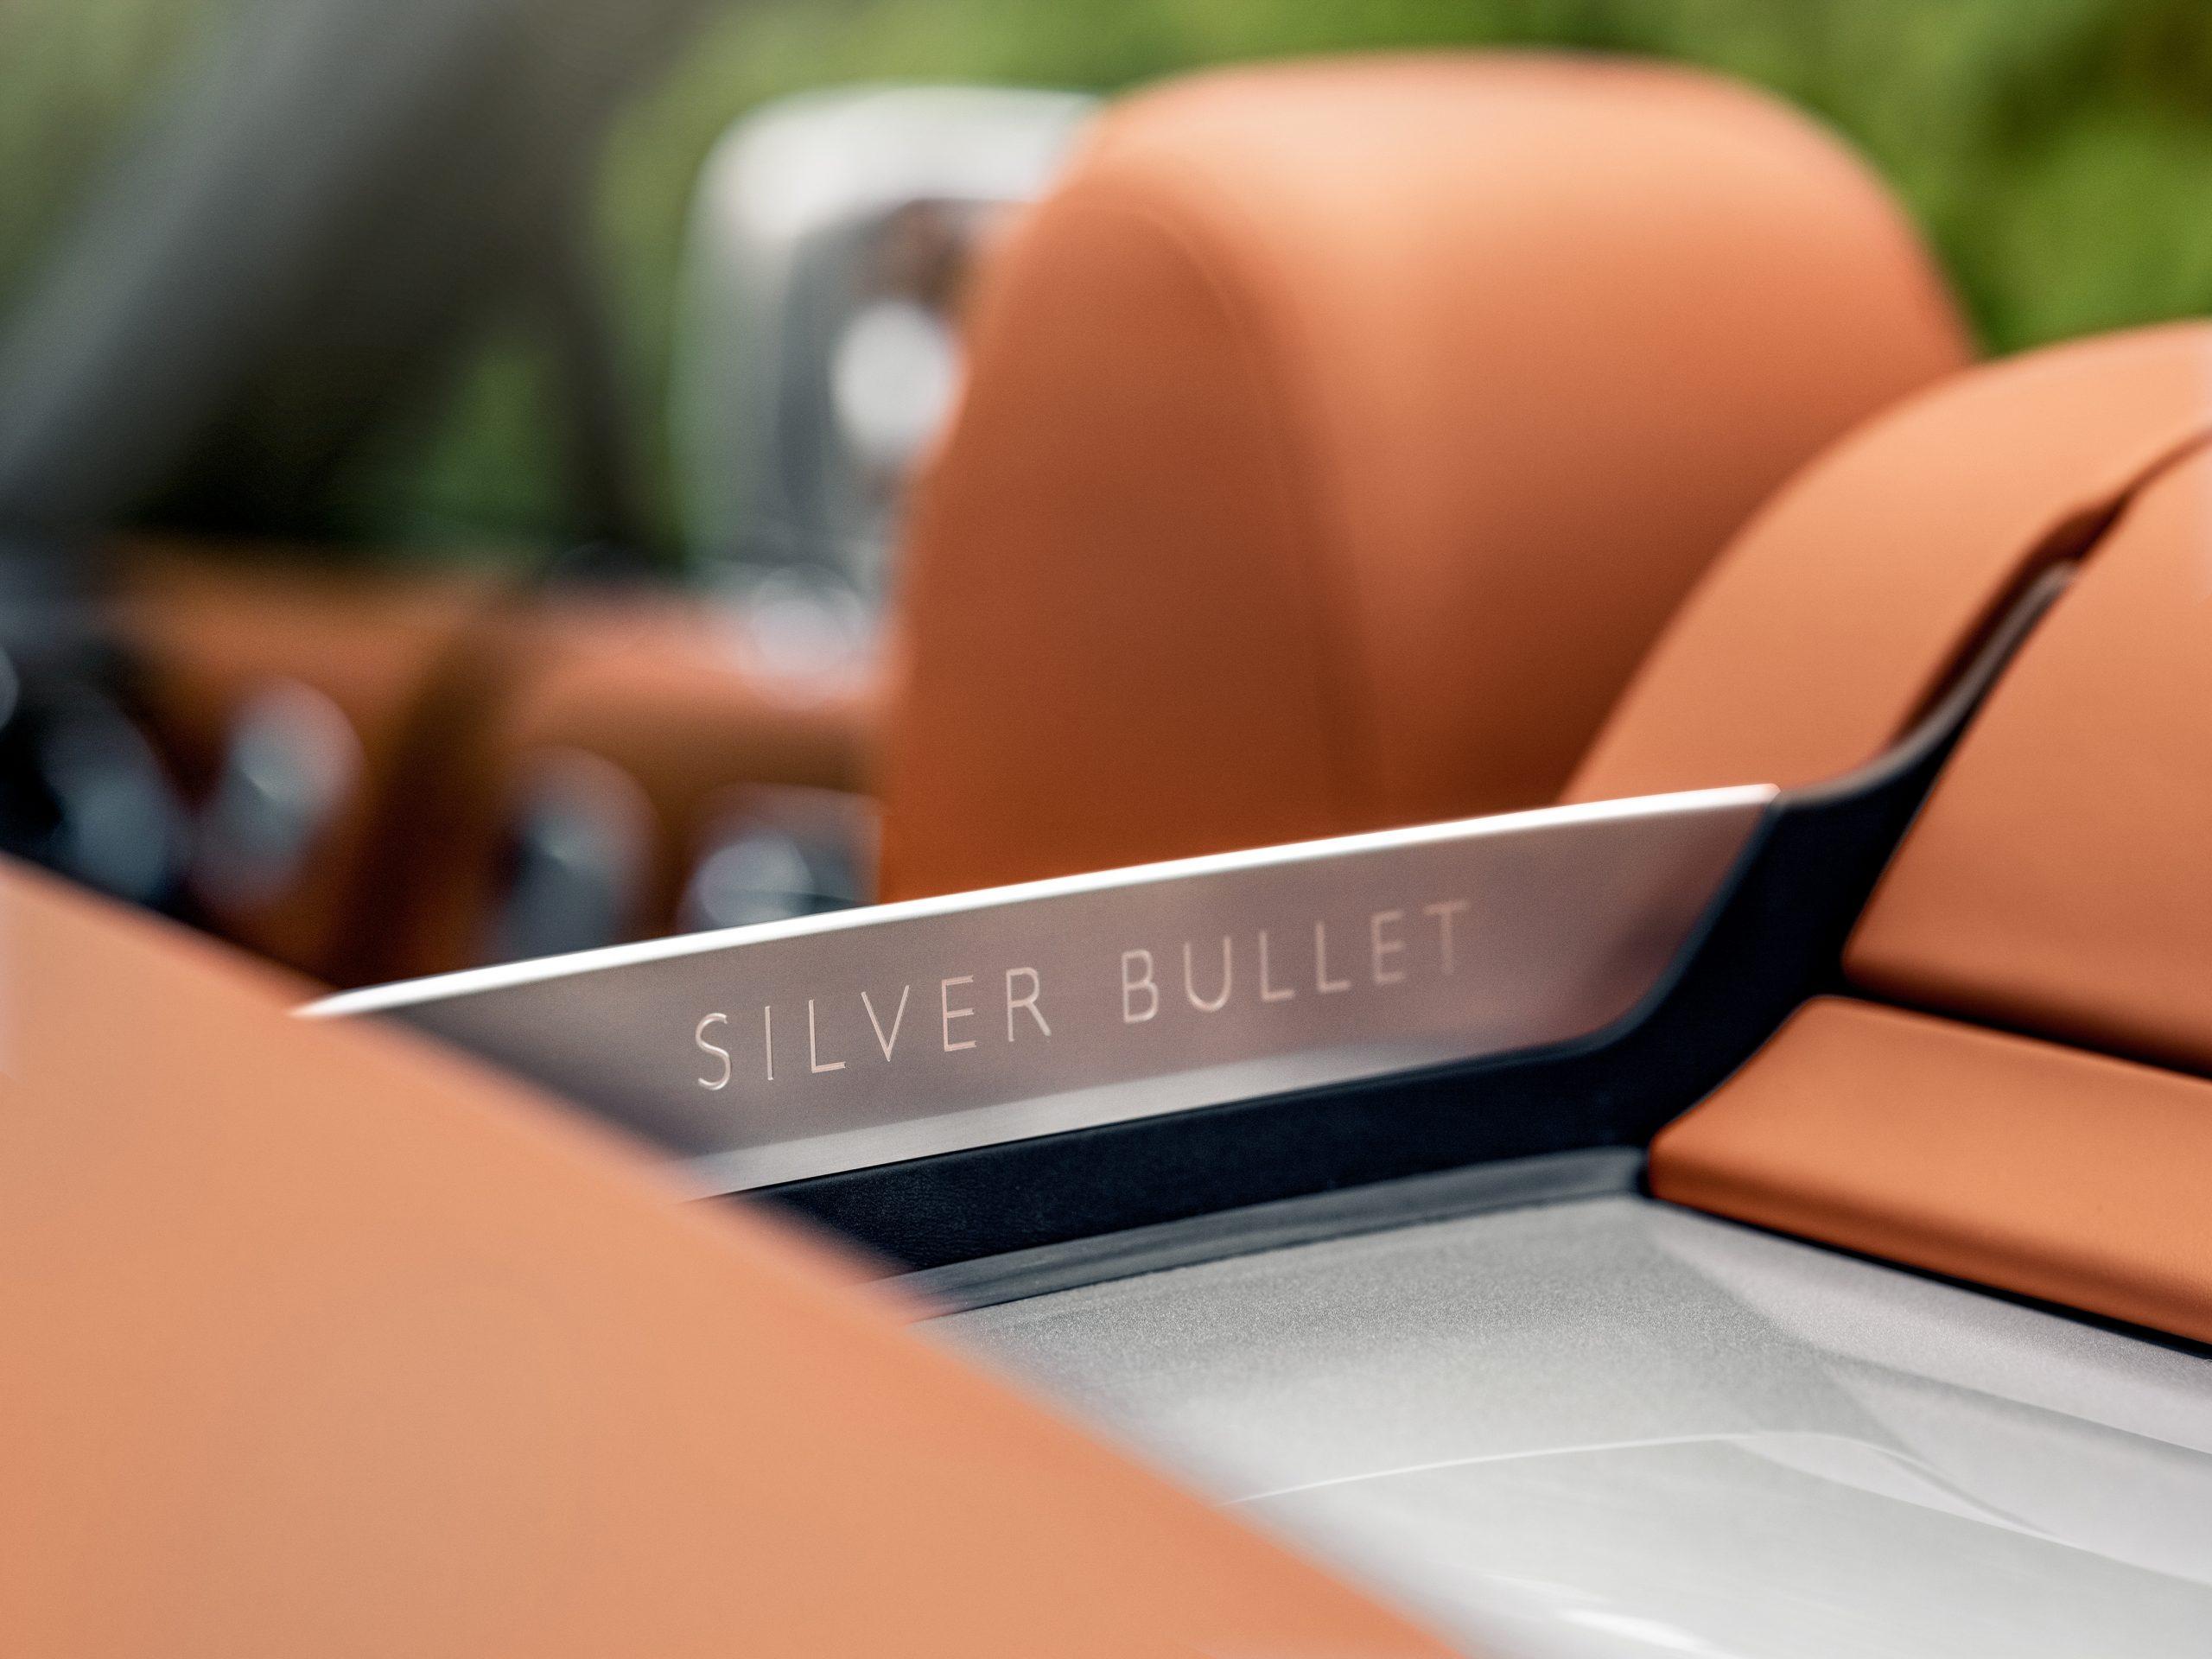 Rolls-Royce Dawn Silver Bullet Aero Cowling Name Angle